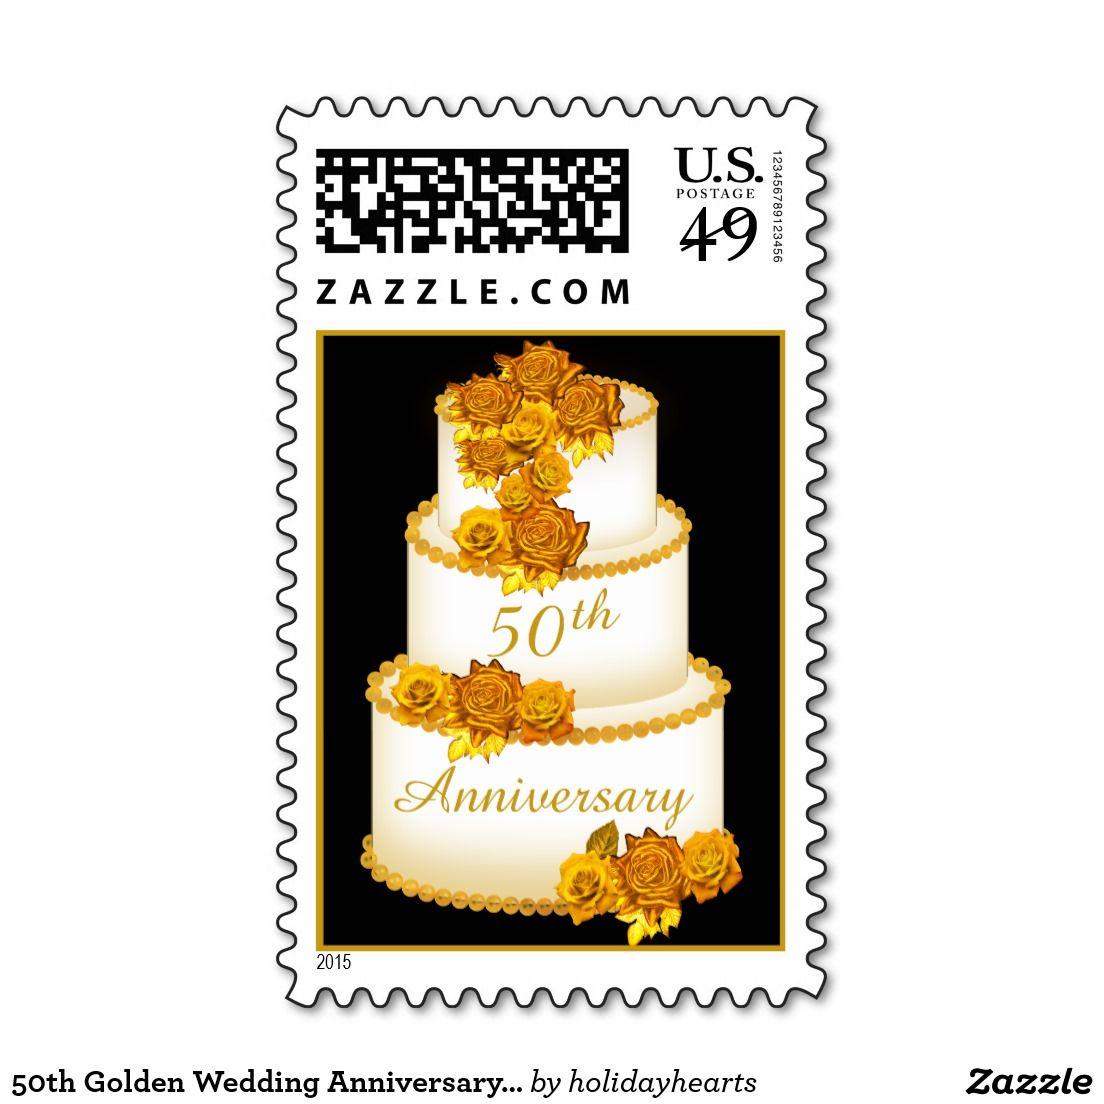 50th Golden Wedding Anniversary Roses Wedding Cake Gifts Shopping Weddding Anni 50 Golden Wedding Anniversary Golden Wedding Anniversary Wedding Cake Roses